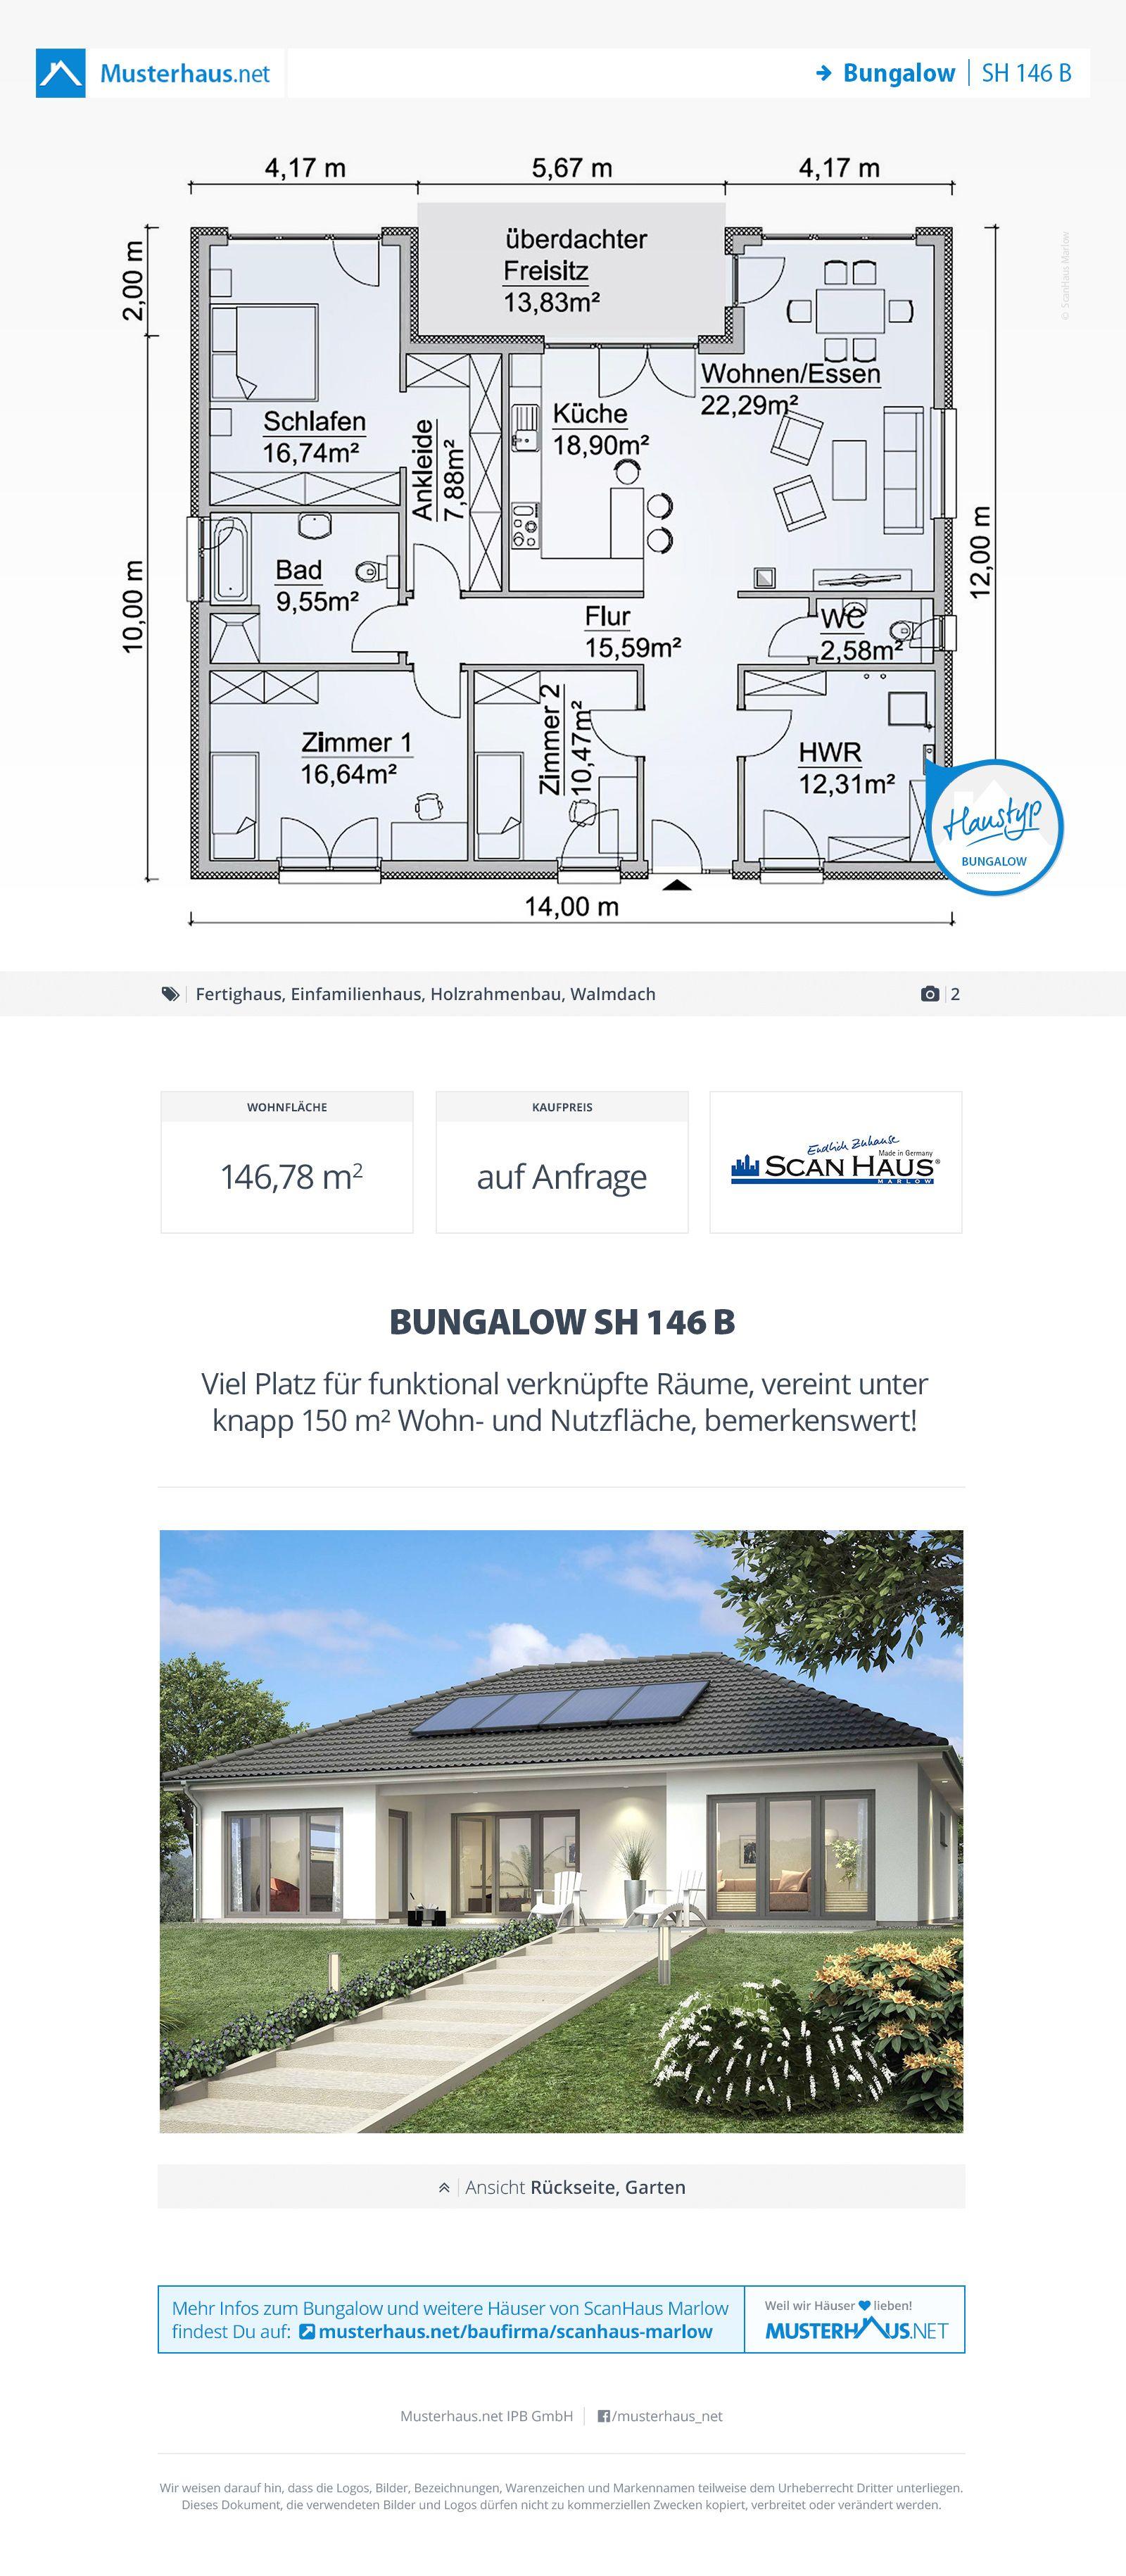 Musterhaus bungalow grundriss  Bungalow Grundriss, 146,78 m², offene Küche, Walmdach | Bungalow ...